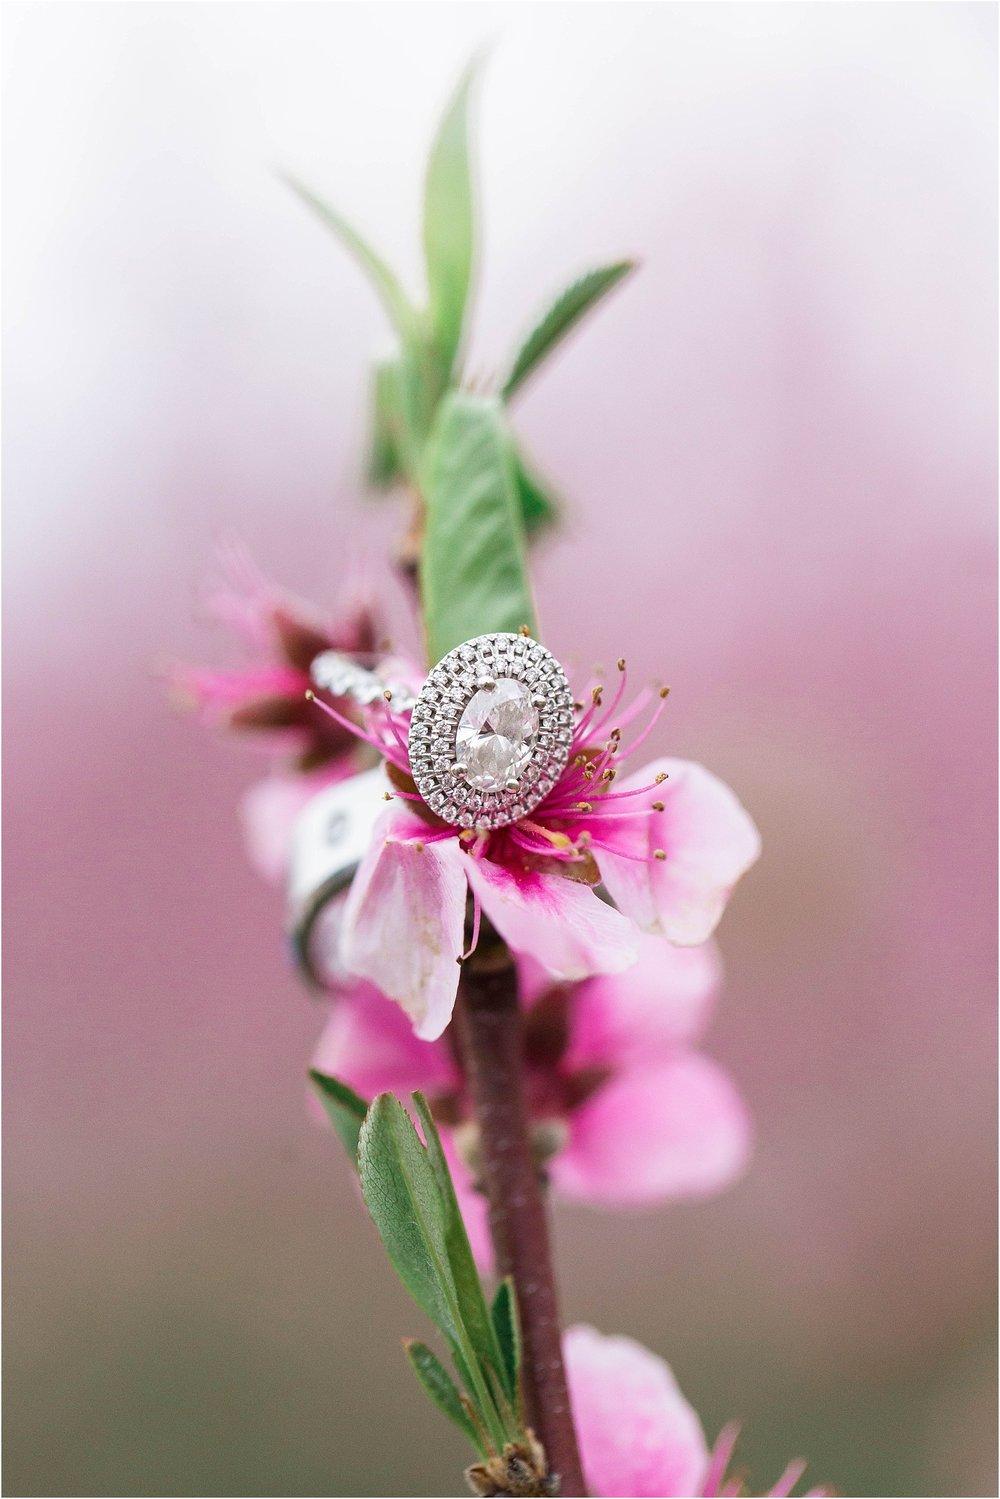 Niagara-on-the-lake-cherry-blossom-farm-Engagement-Session-Toronto-Mississauga-Brampton-Scarborough-GTA-Pakistani-Indian-Wedding-Engagement-Photographer-Photography_0033.jpg